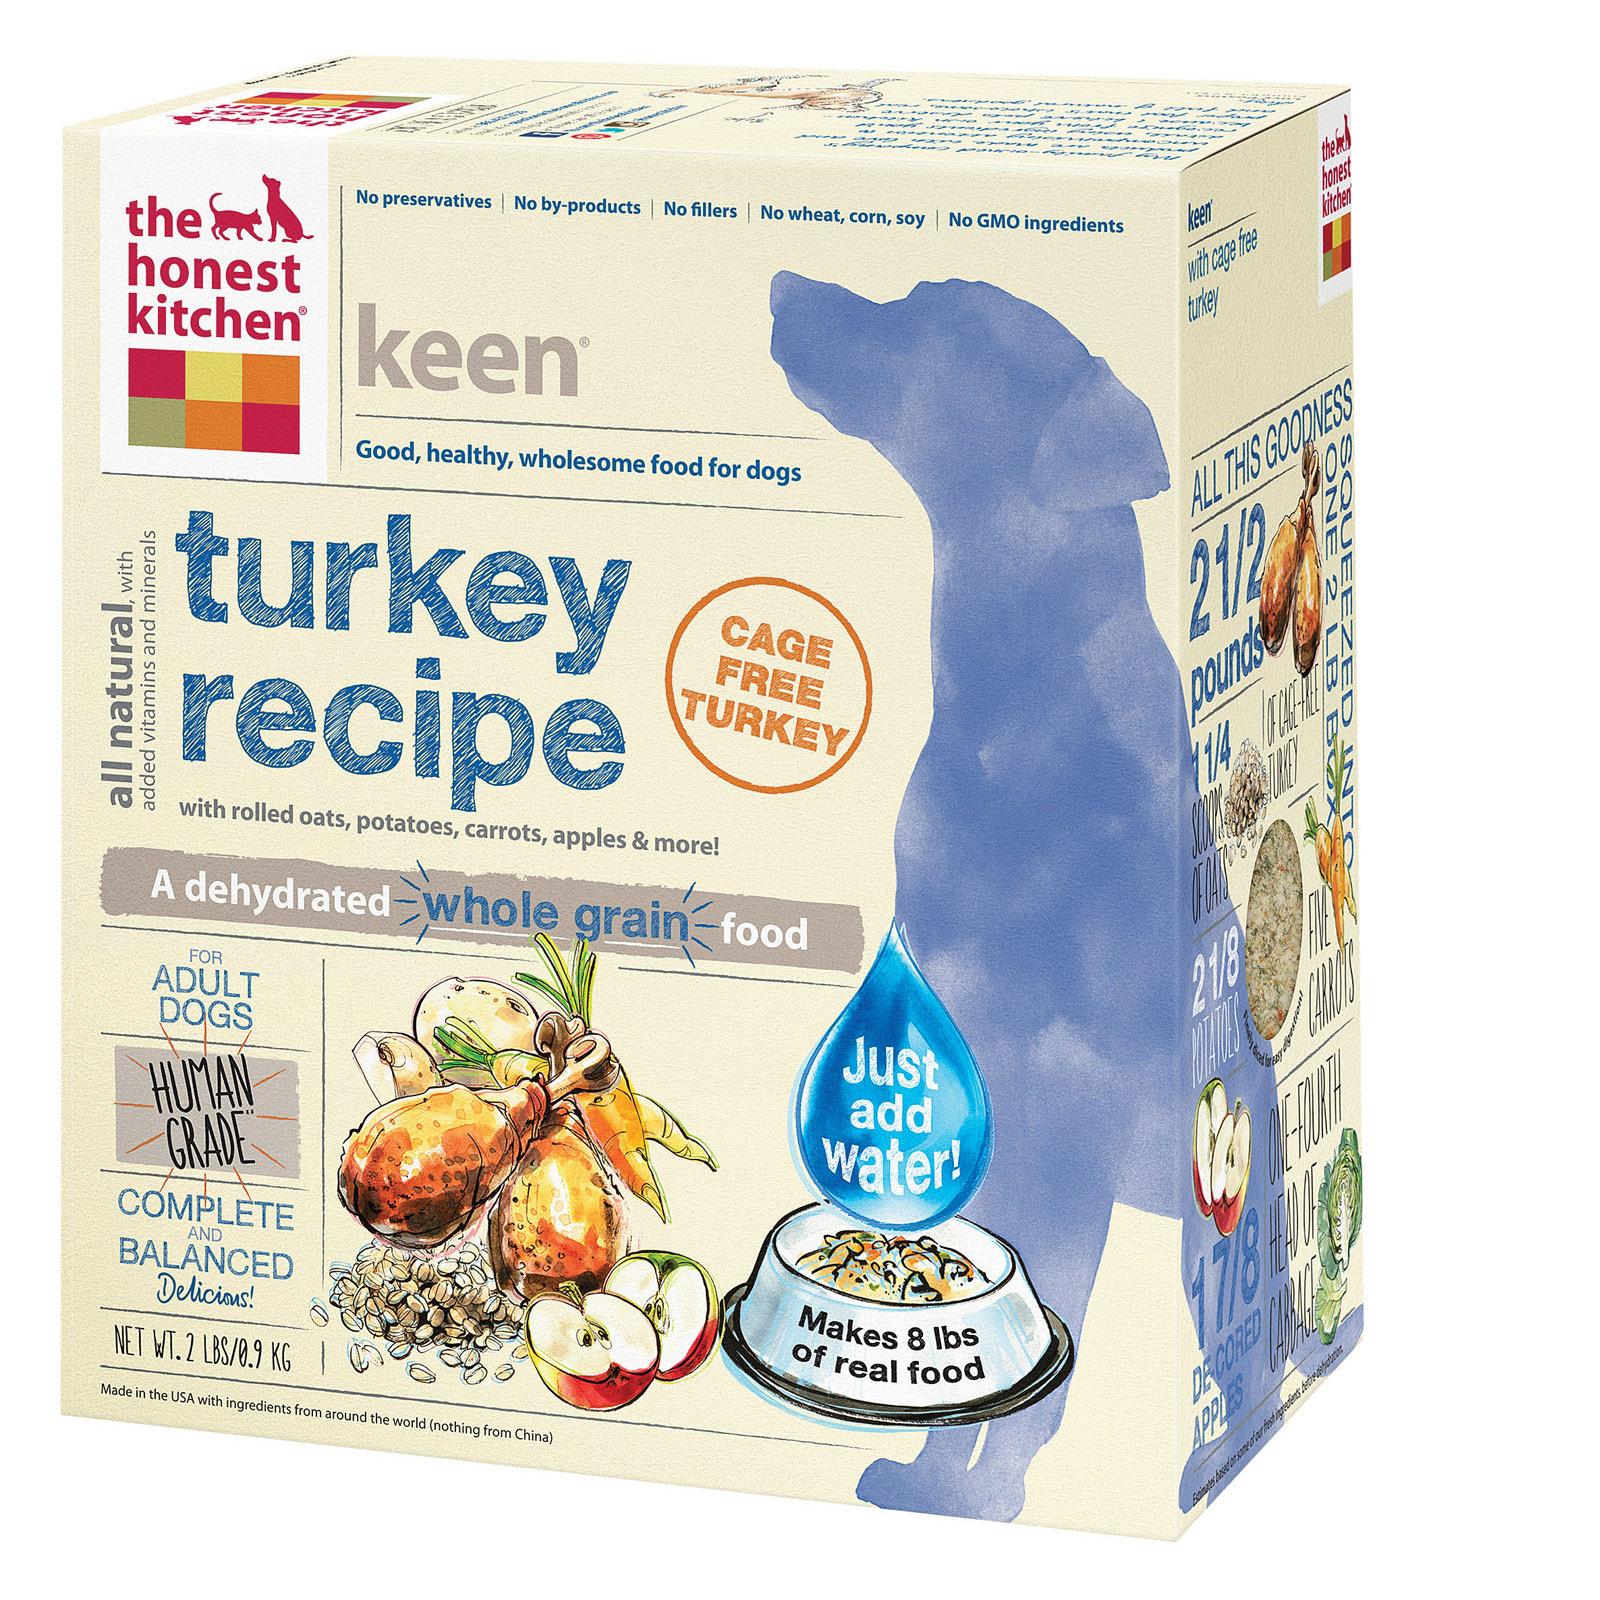 The Honest Kitchen Keen - Whole Grain Turkey Dog Food - Case of 6 - 2 lb.